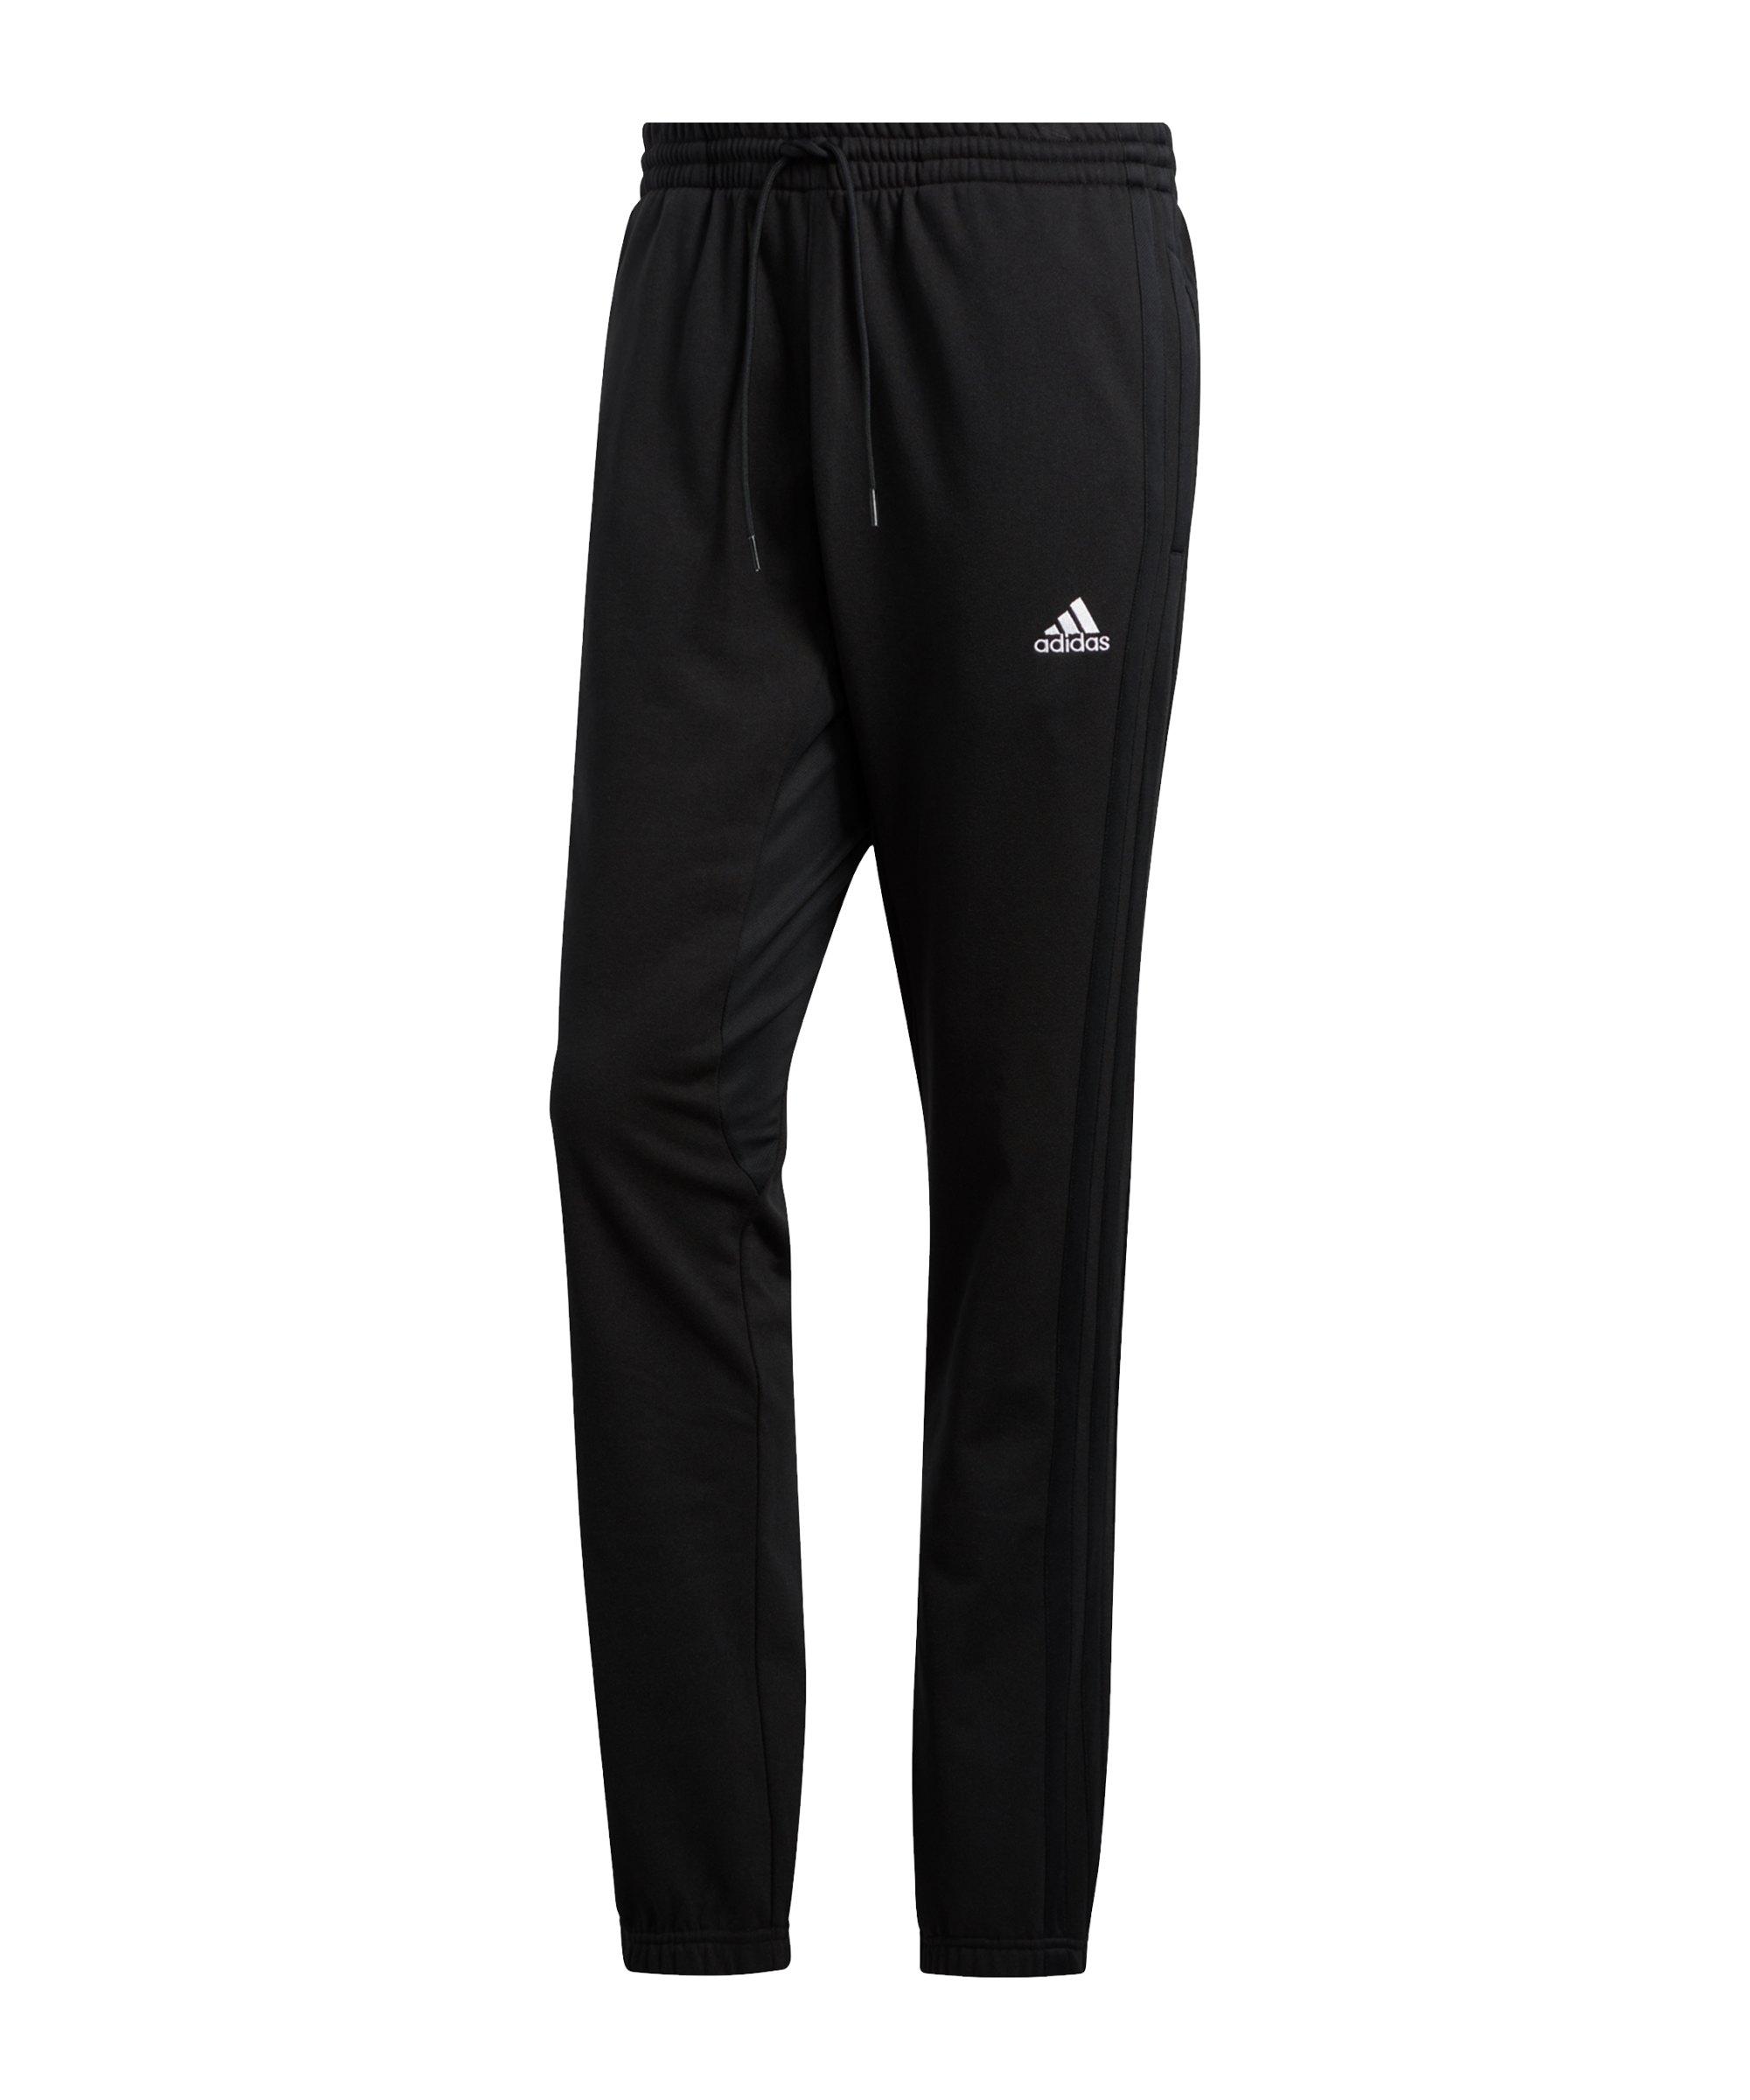 adidas LD Jogginghose Schwarz - schwarz